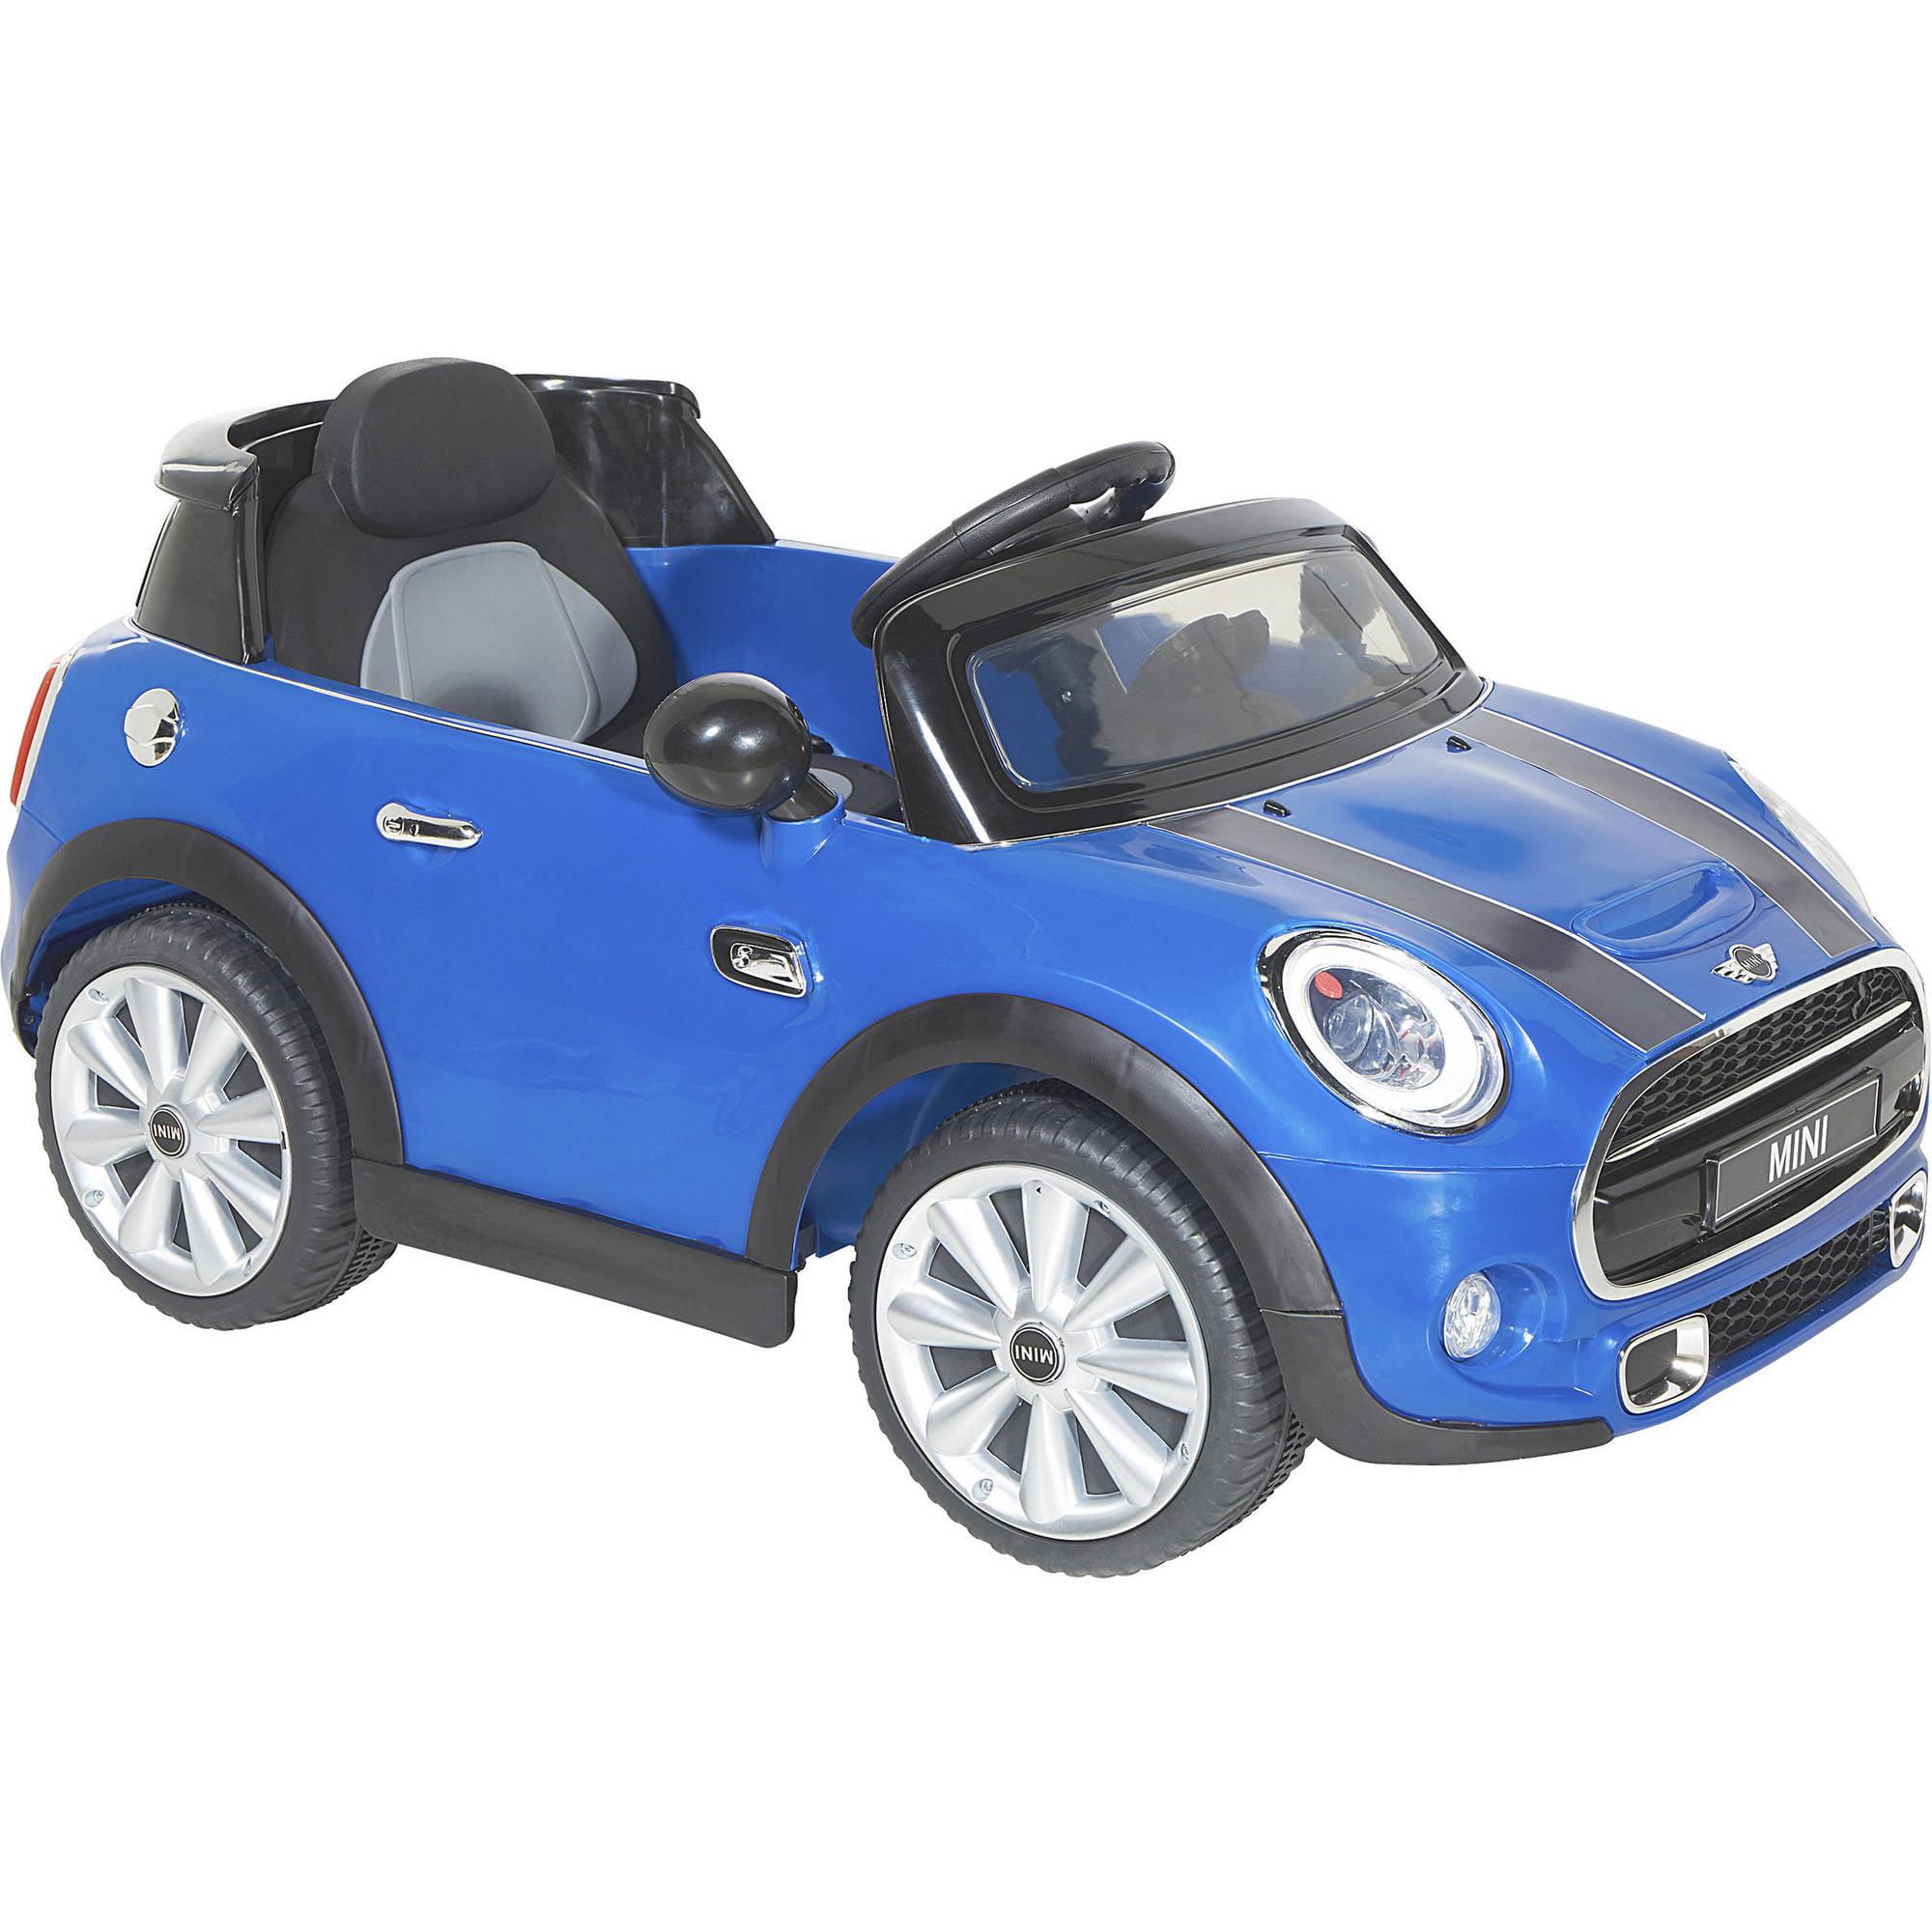 Mini Cooper Ride-On, 6V